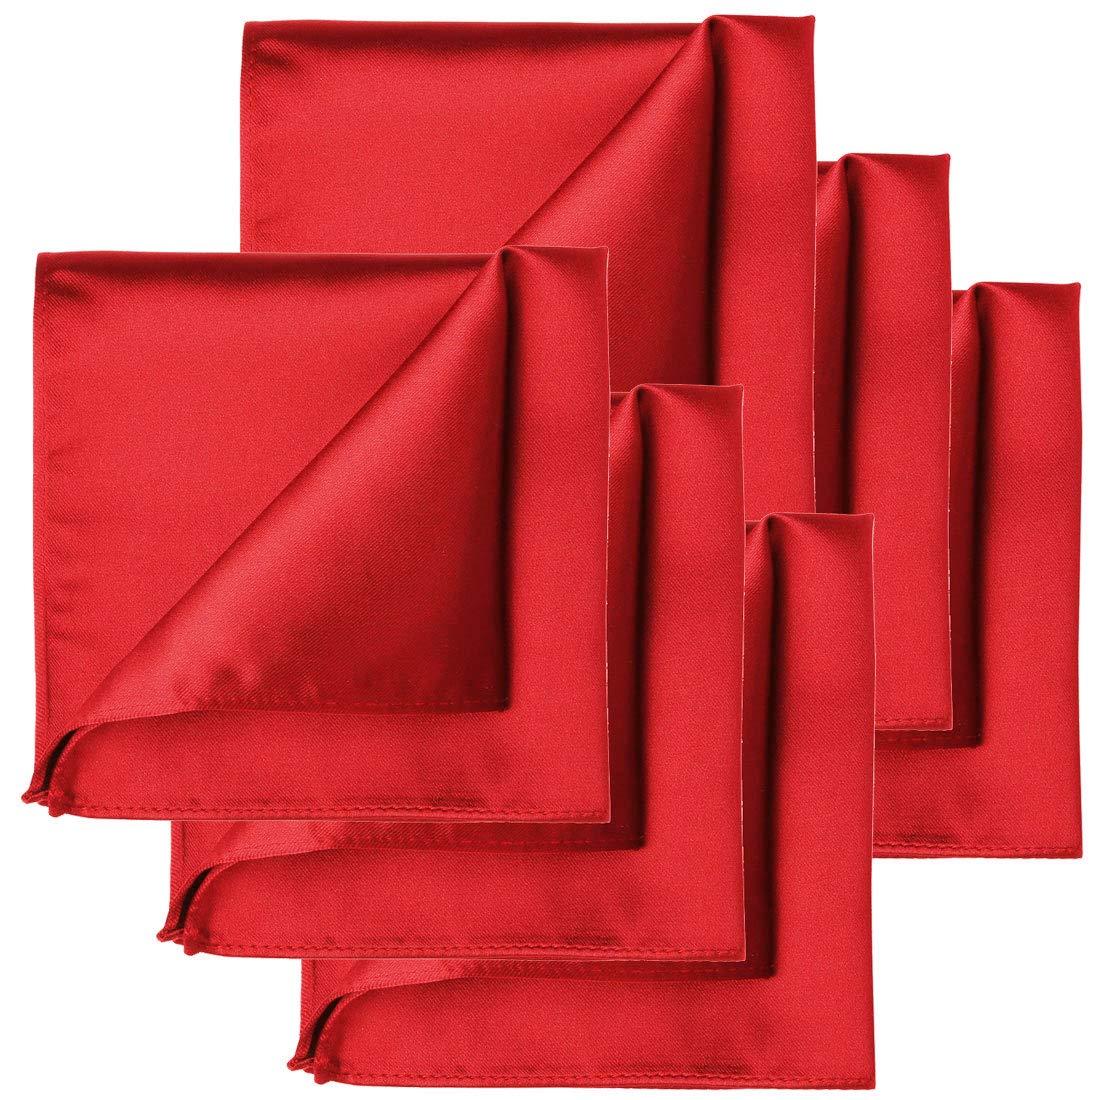 KissTies 6 PCS Red Satin Pocket Square Solid Color Hankies Gift Set